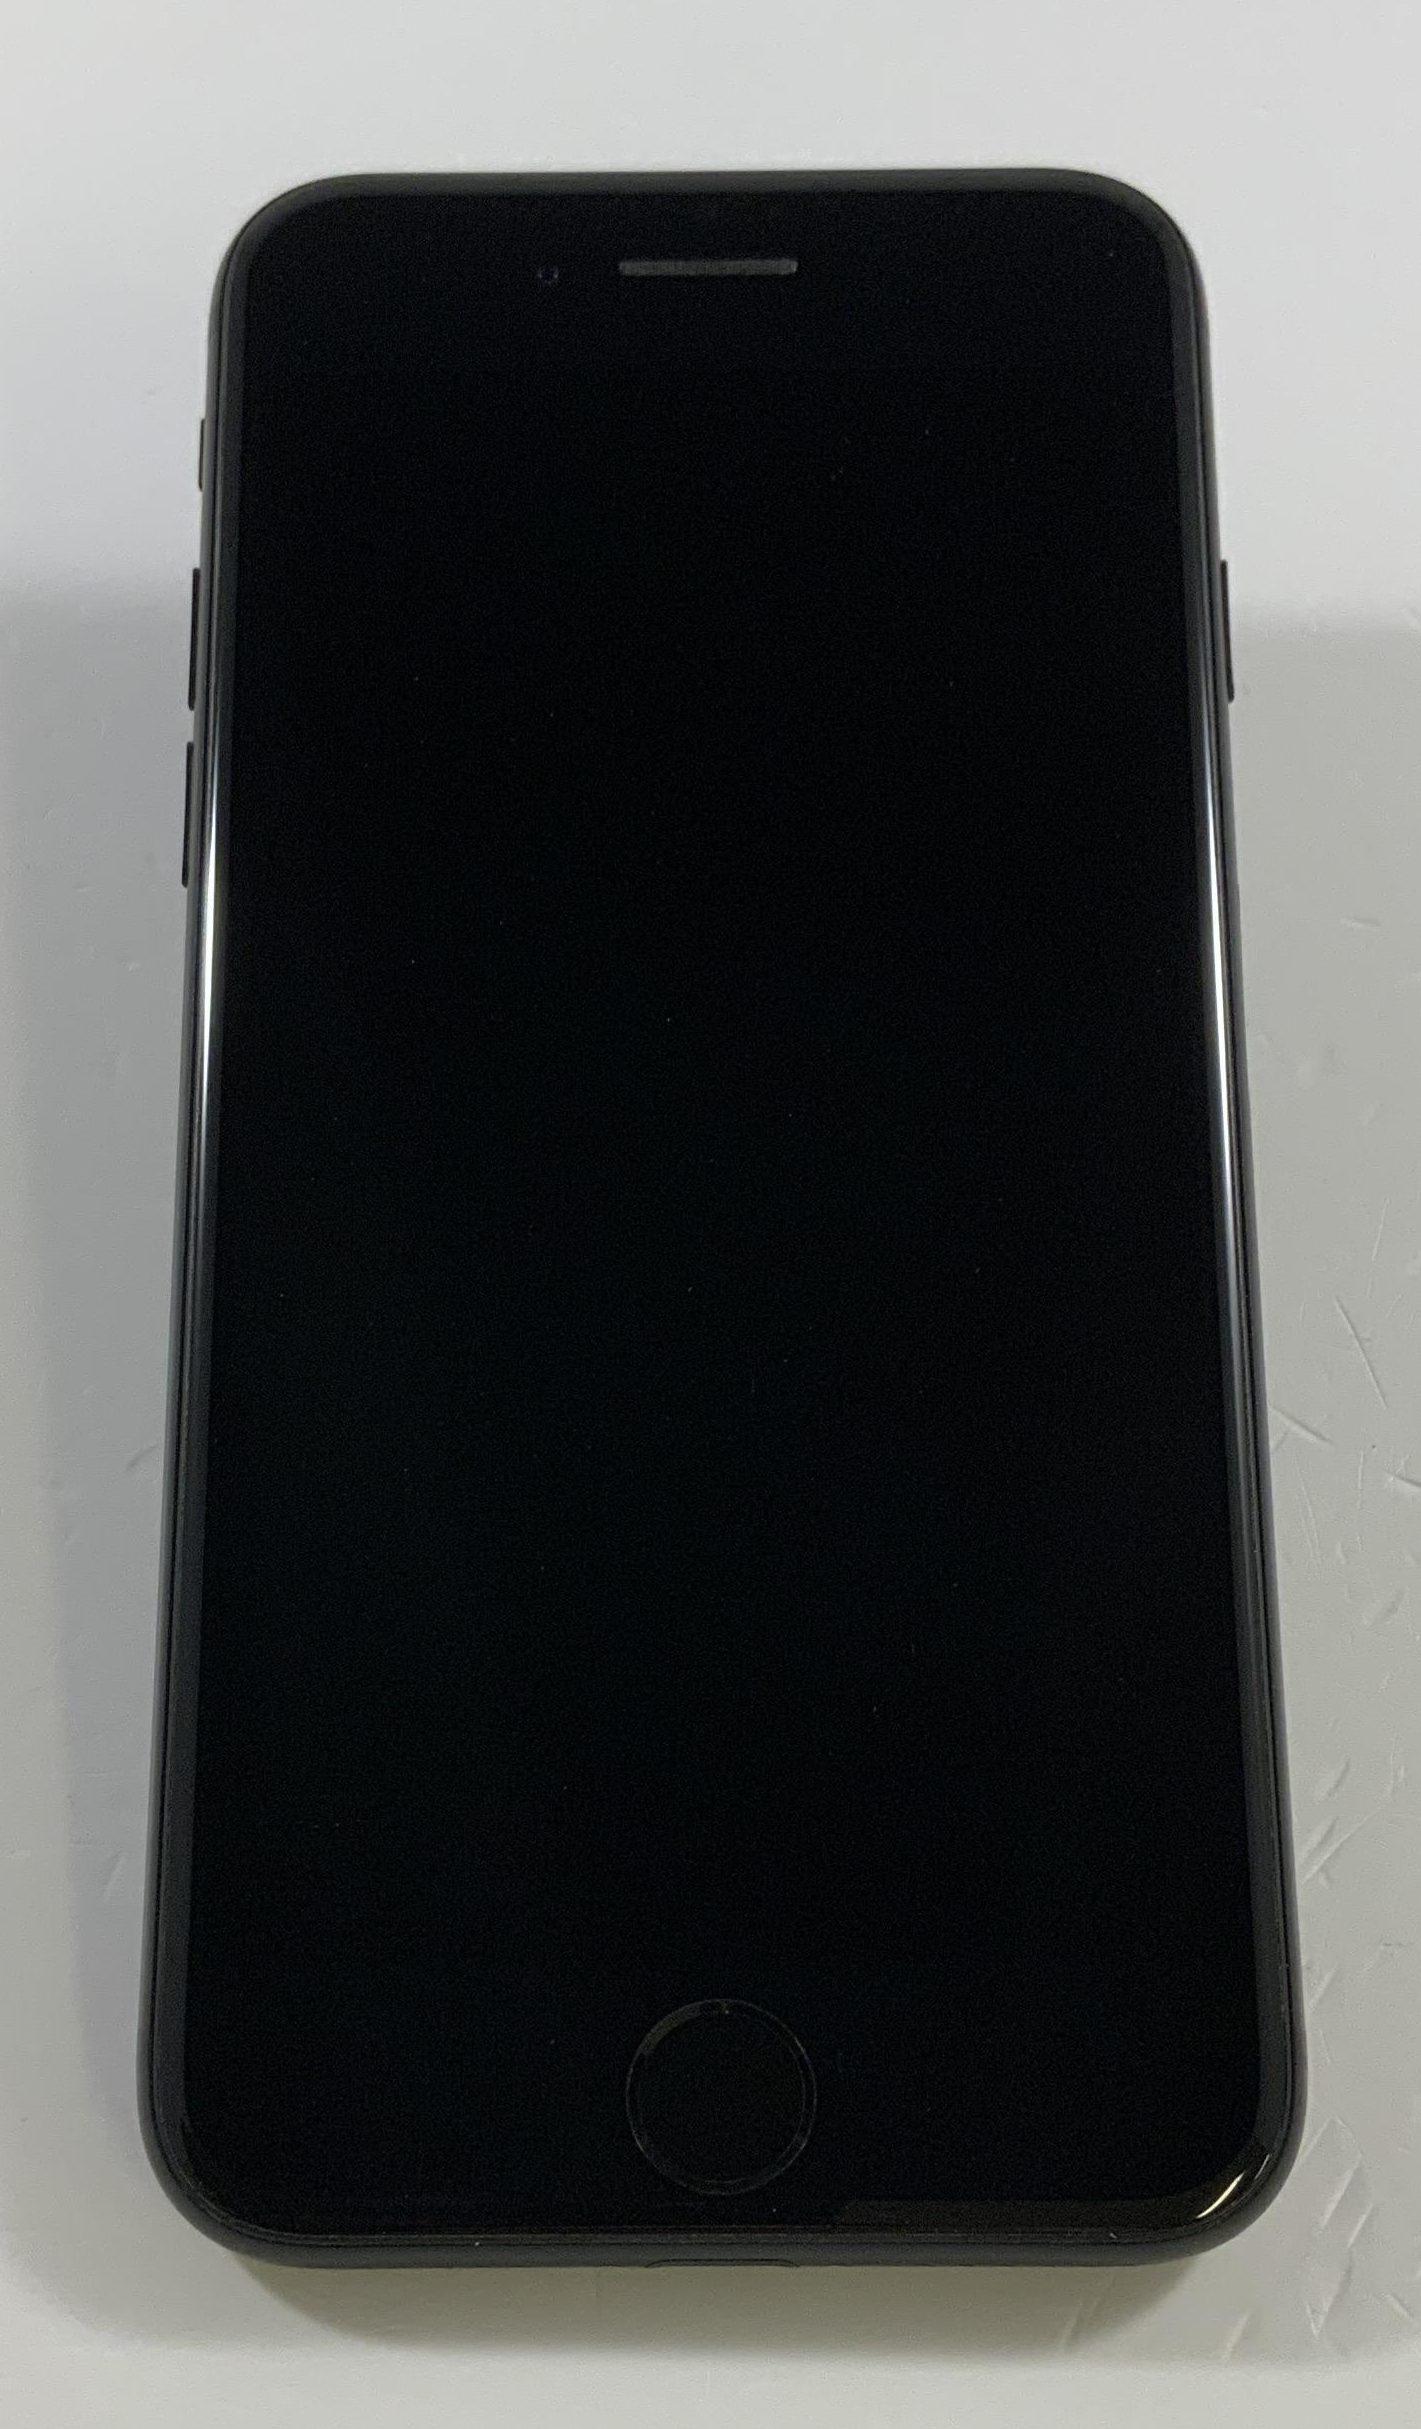 iPhone 7 32GB, 32GB, Black, Afbeelding 1